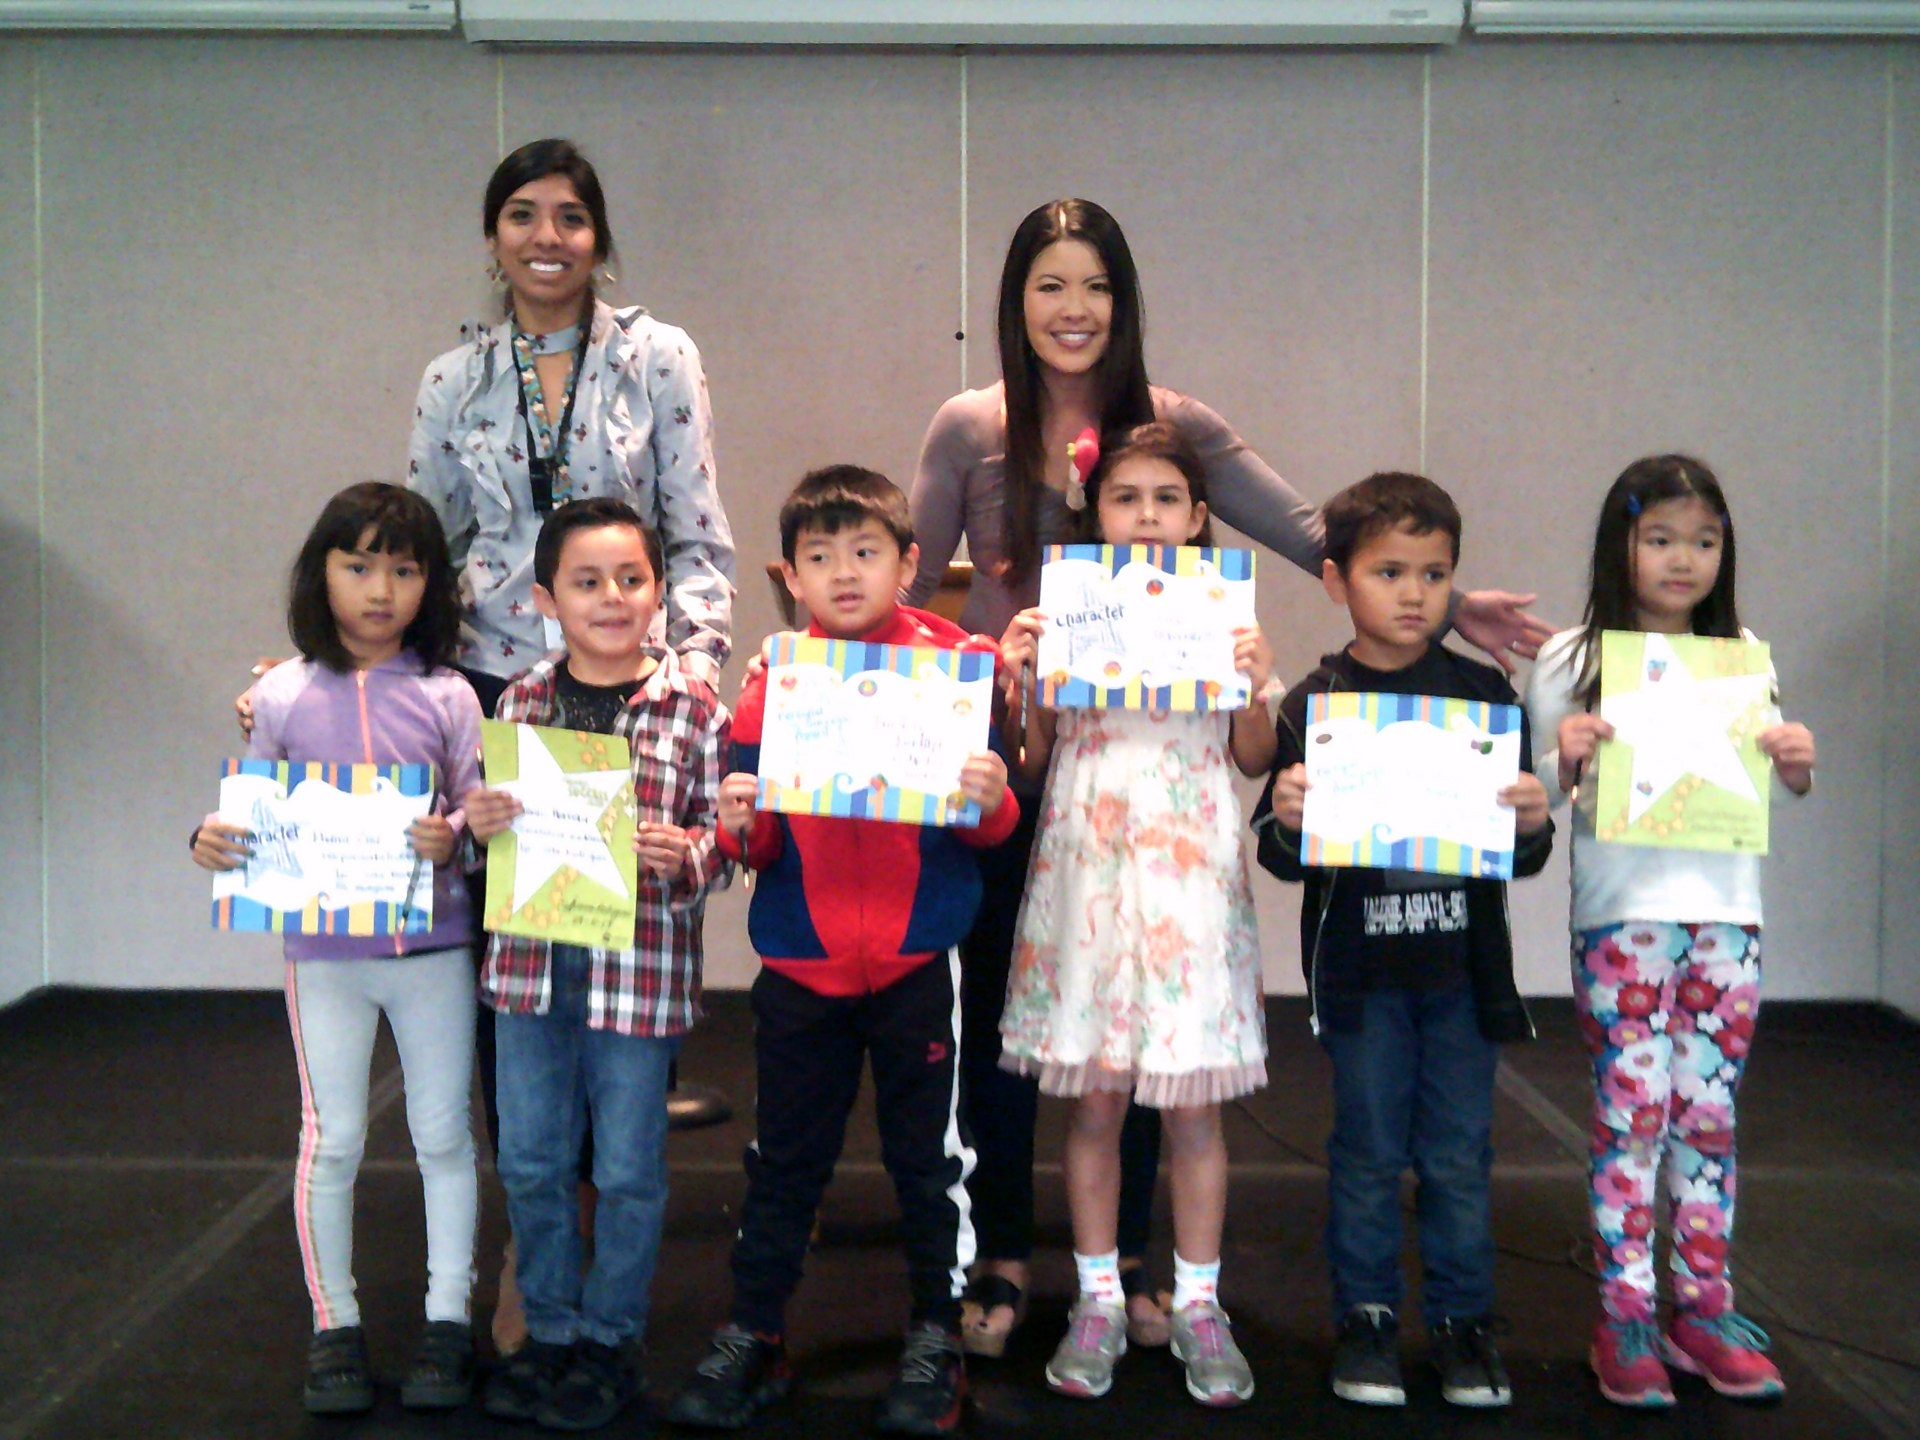 Ms. Rodriguez's & Mrs. Kim's November Honorees